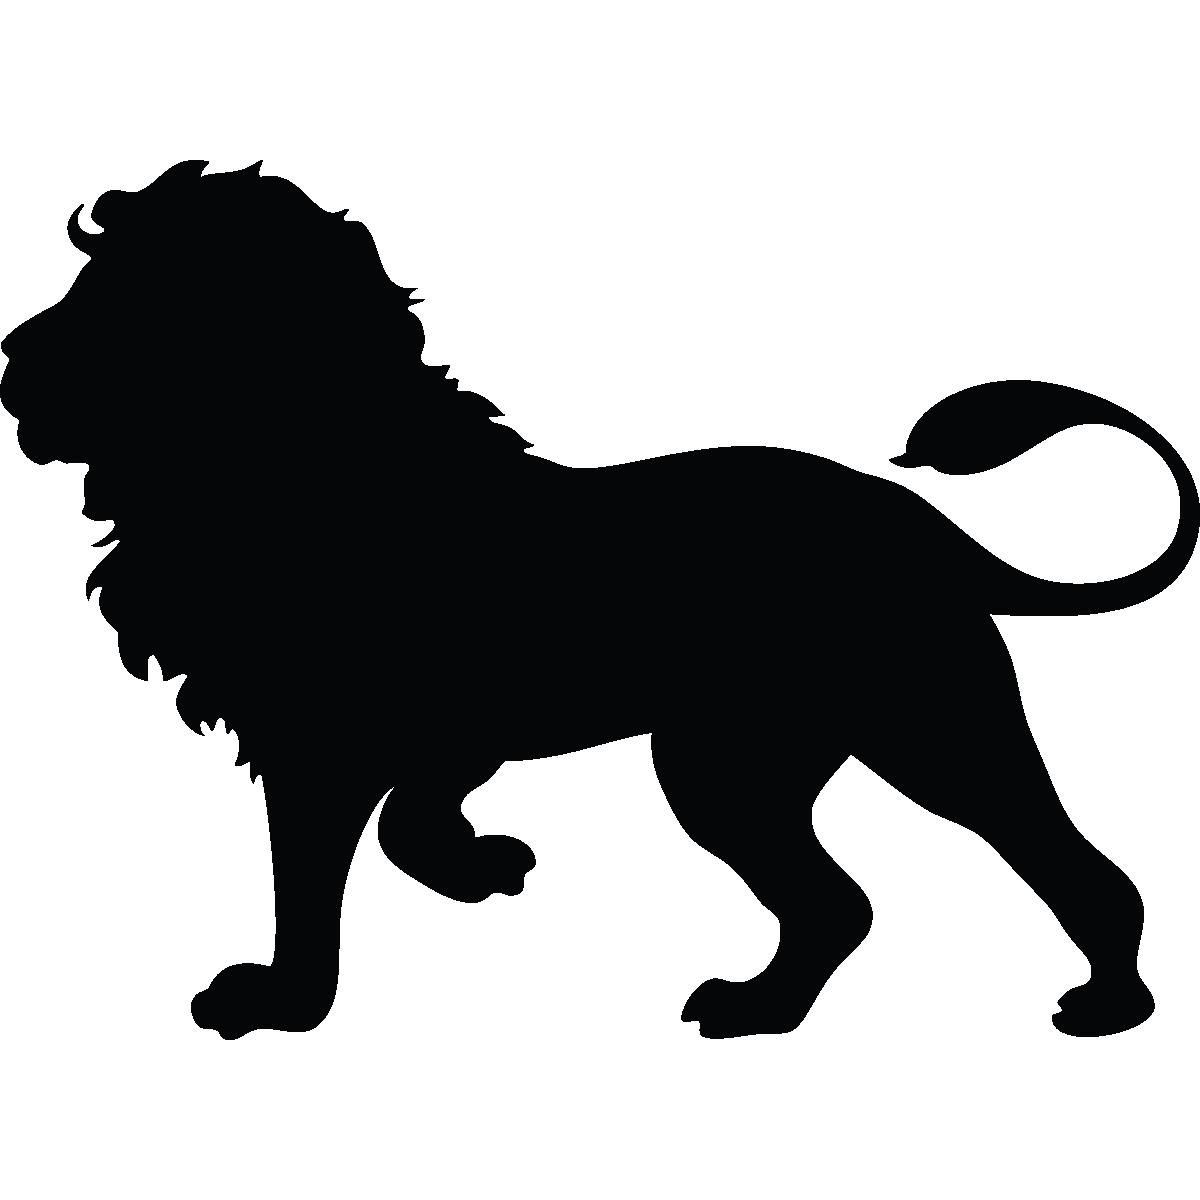 1200x1200 Sticker Silhouette Lion Majestueux Lion Silhouette, Silhouette